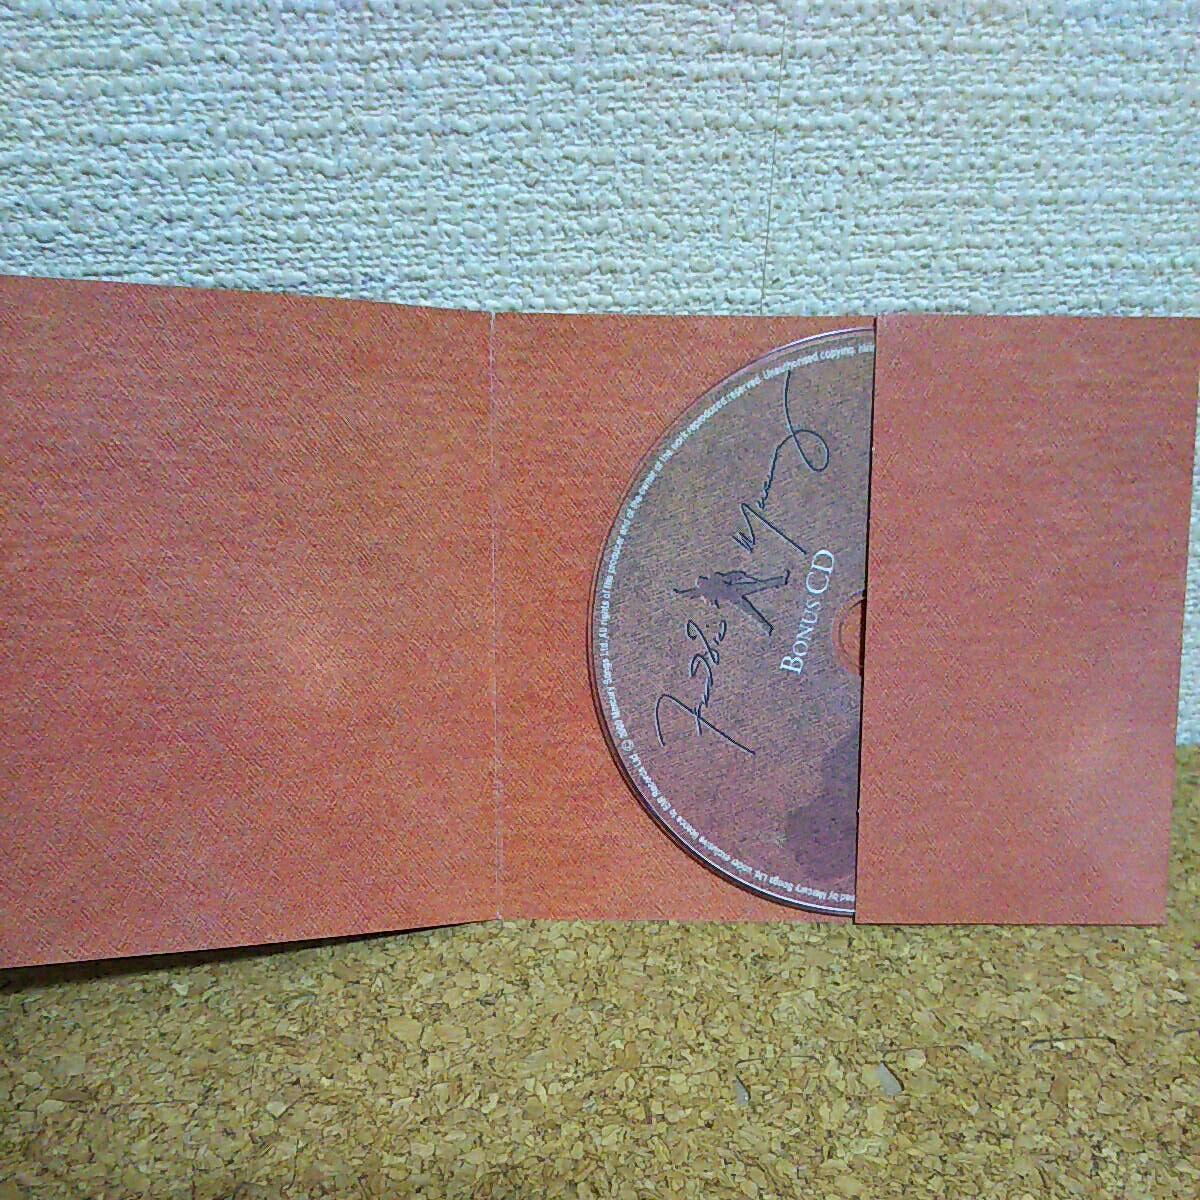 FREDDIE MERCURY/Solo 輸入盤CD3枚組 2CD+BonusCD フレディ・マーキュリー クィーン_画像7